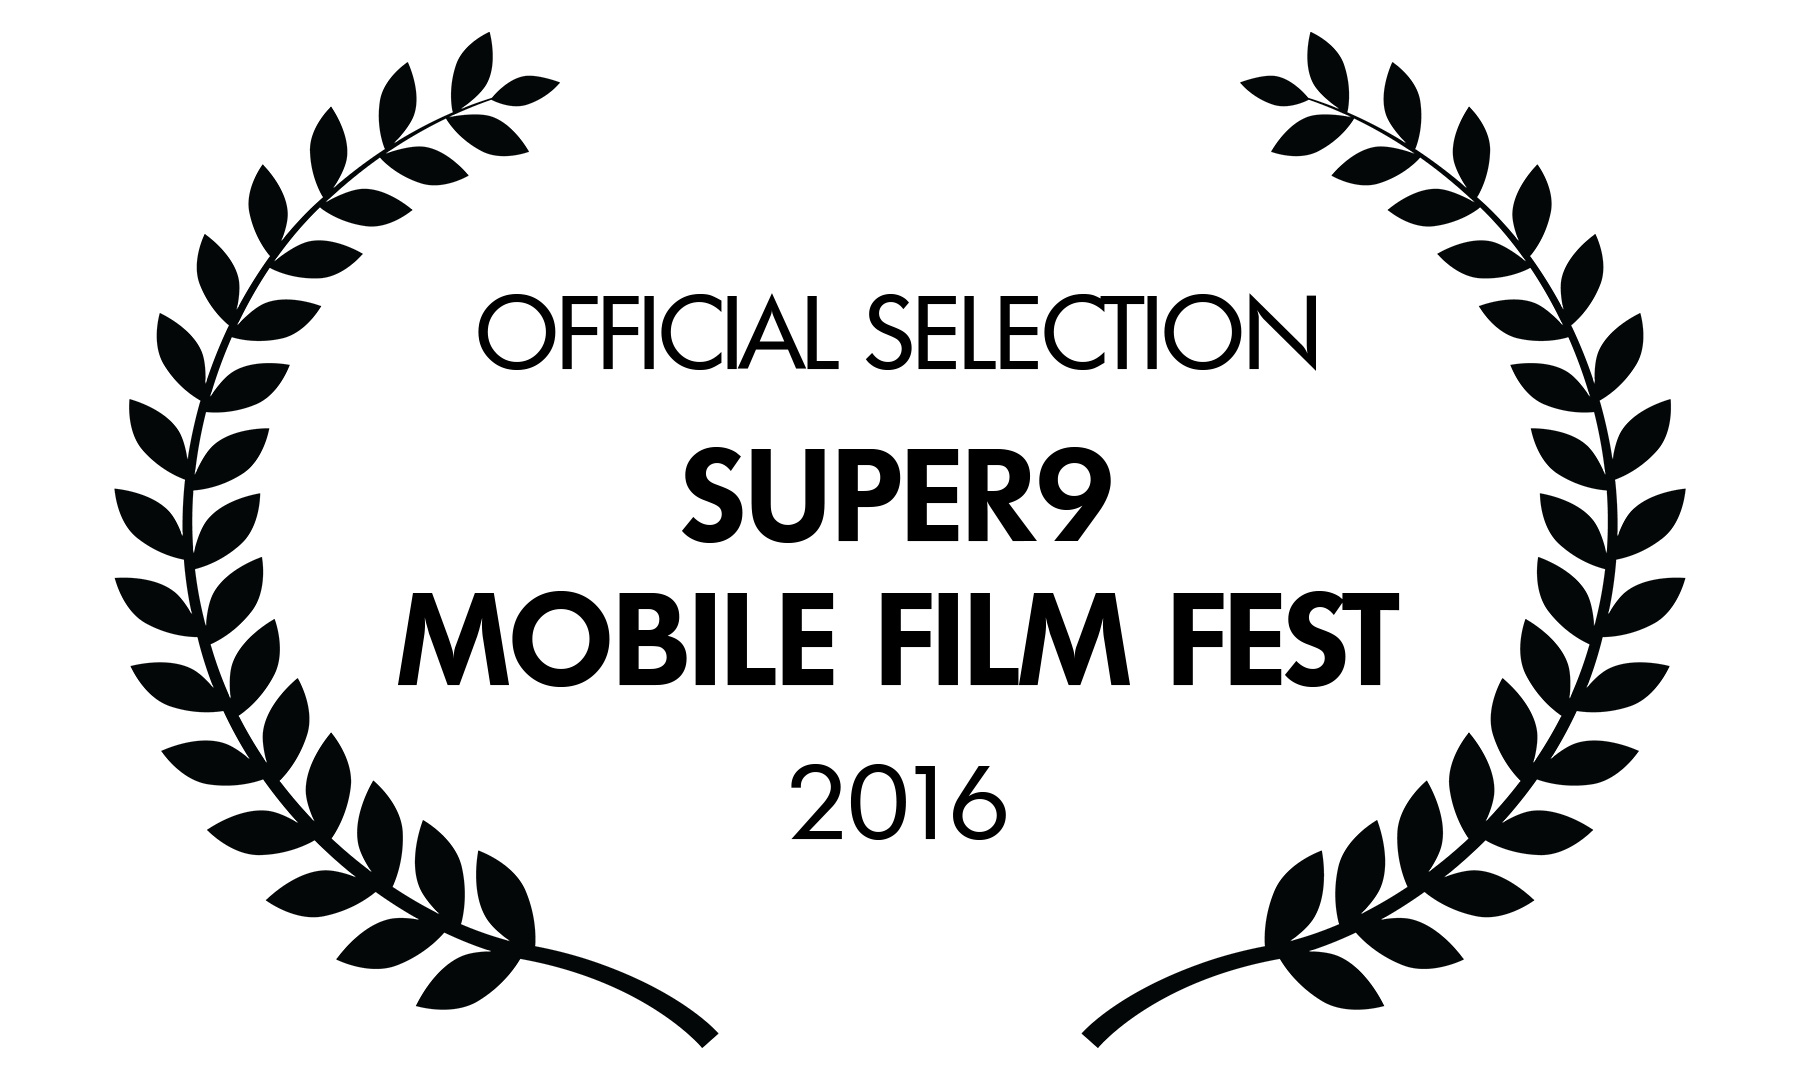 Vencedores Super 9 Mobile Film Fest 2016 • Super 9